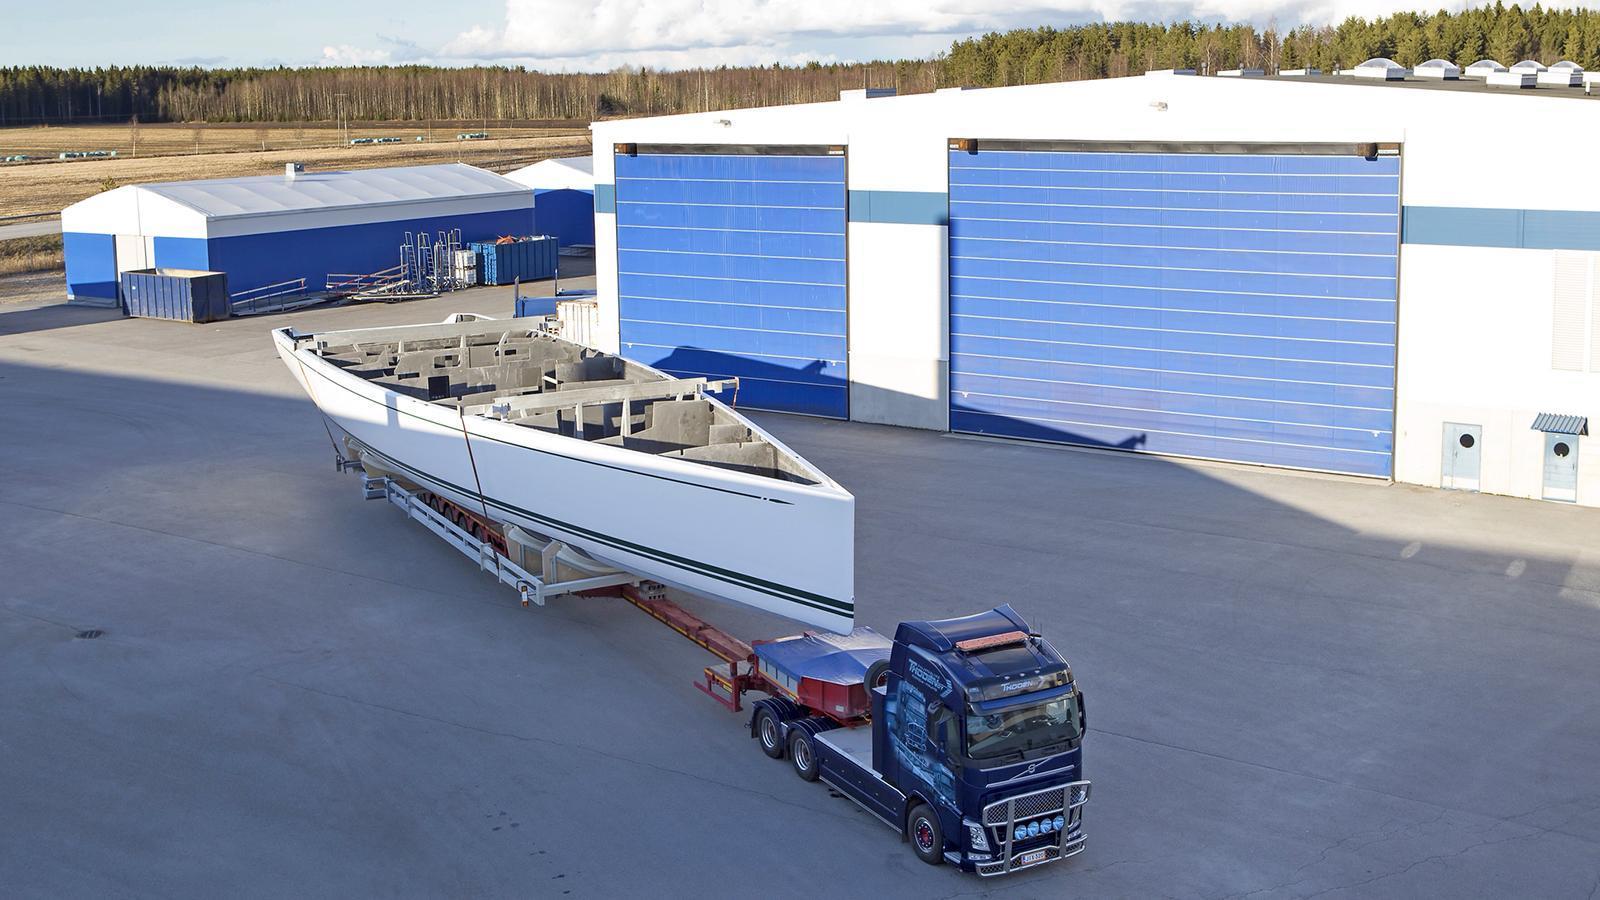 highland-fling-nautors-swan-sailing-yacht-2016-35m-hull-yard